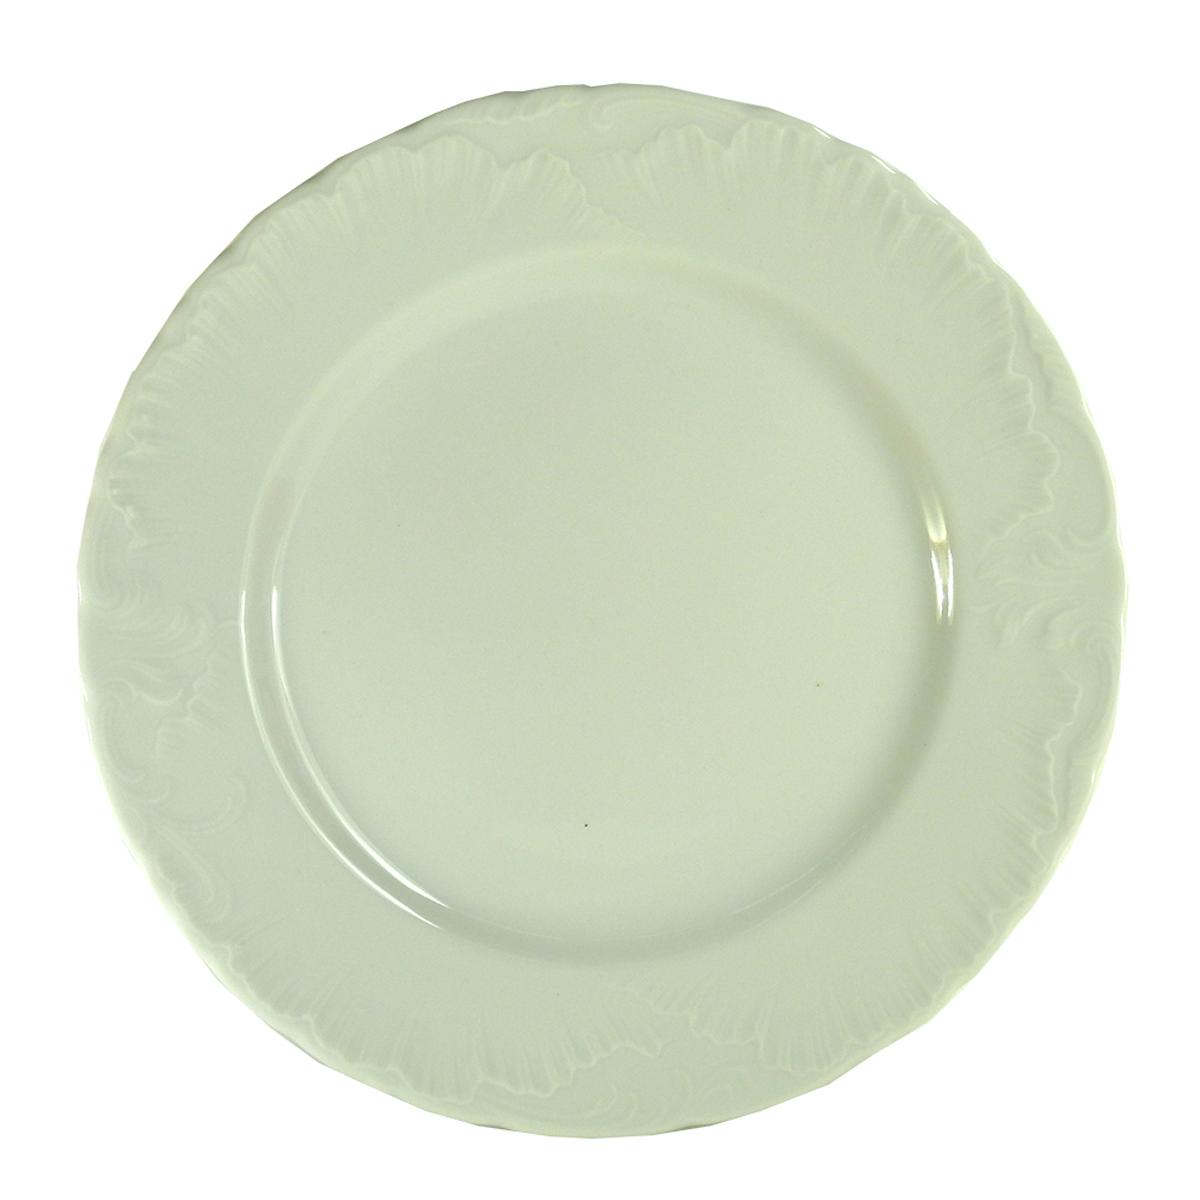 Тарелка десертная Cmielow Rococo, диаметр 19 см cms 26 2 десертная тарелка гибискус pavone